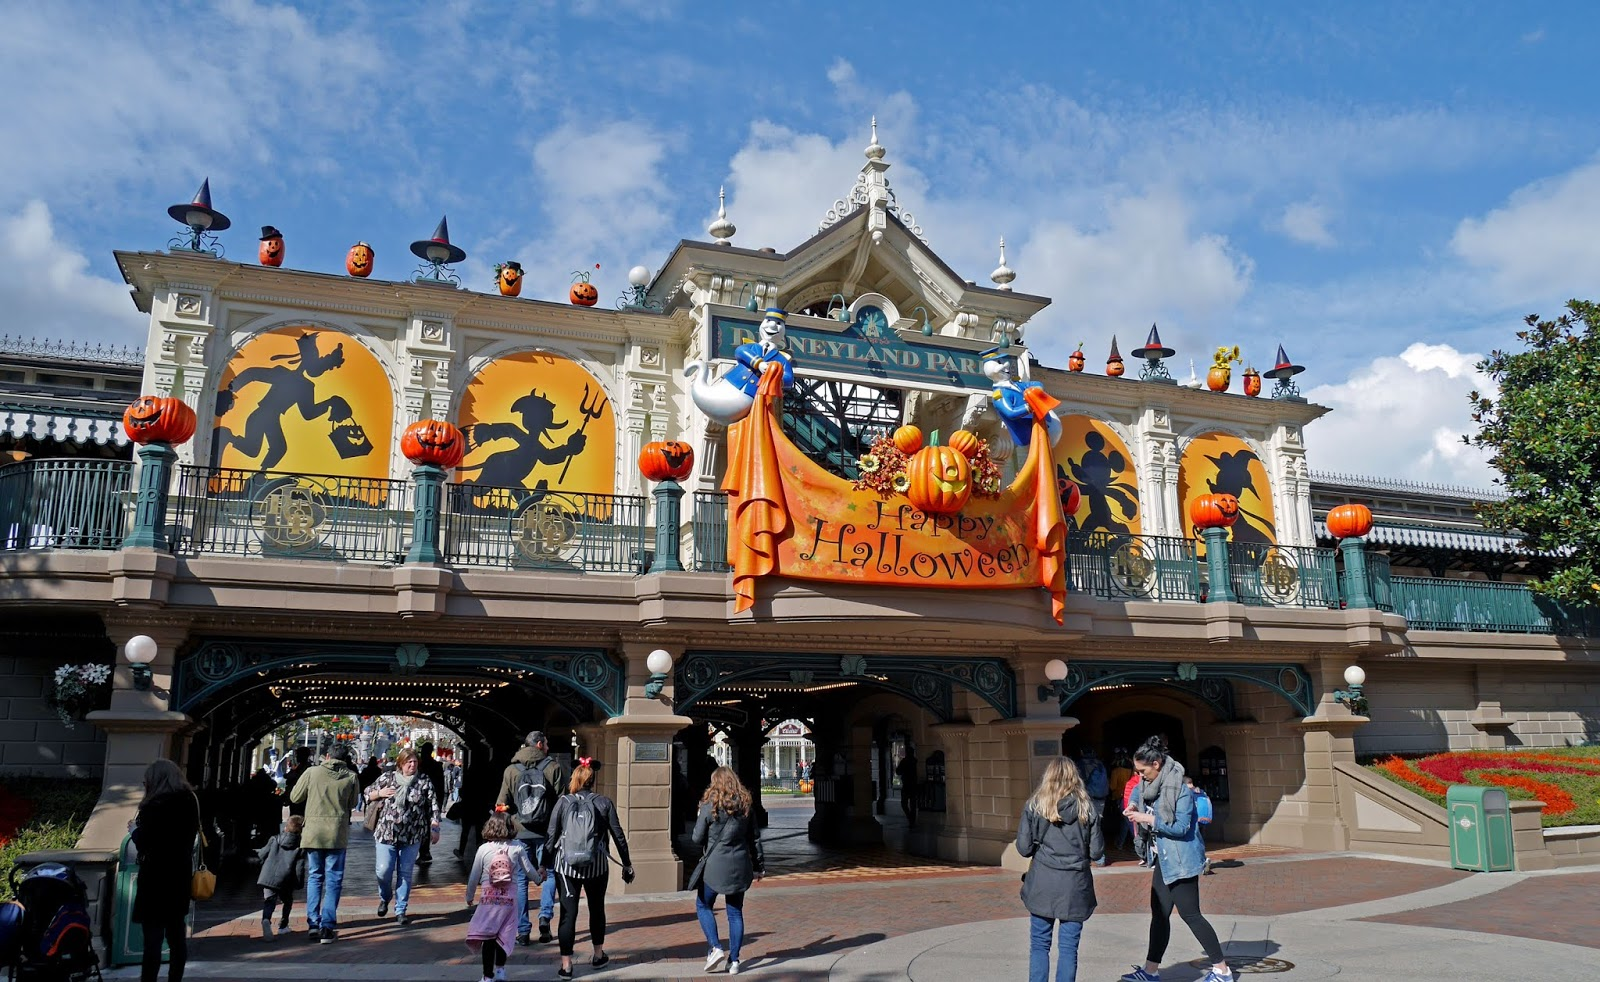 Halloween display above the Disneyland Park entrance, Disneyland Paris